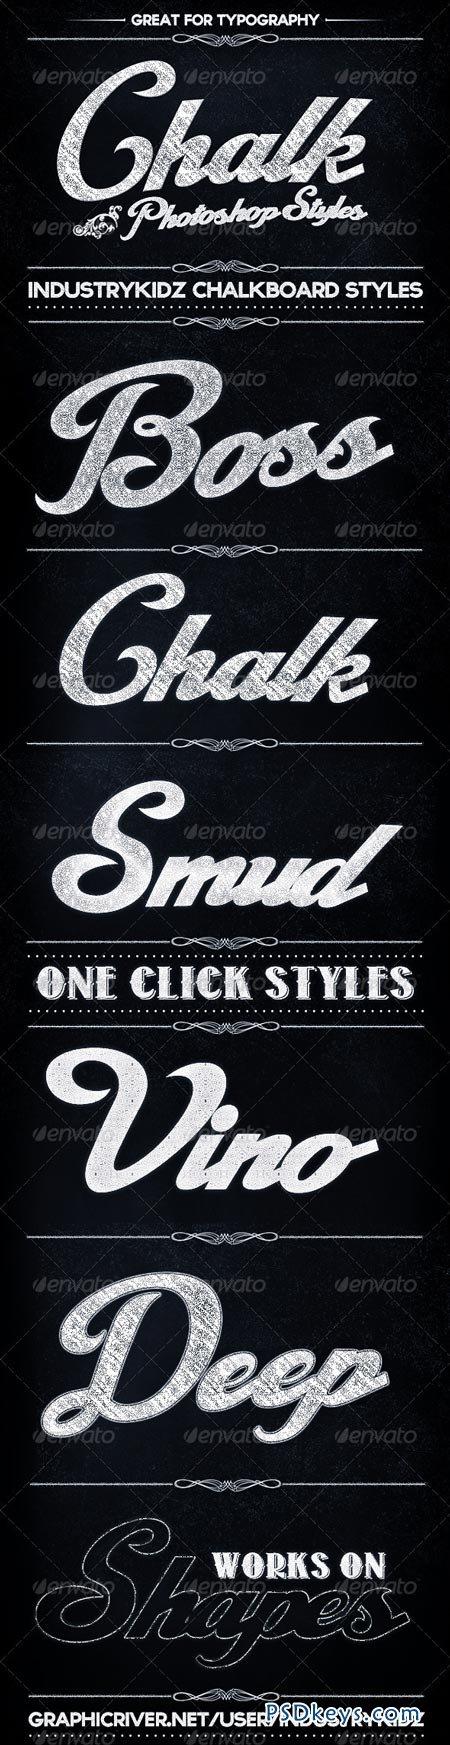 Chalkboard Photoshop Layer Styles 3585861